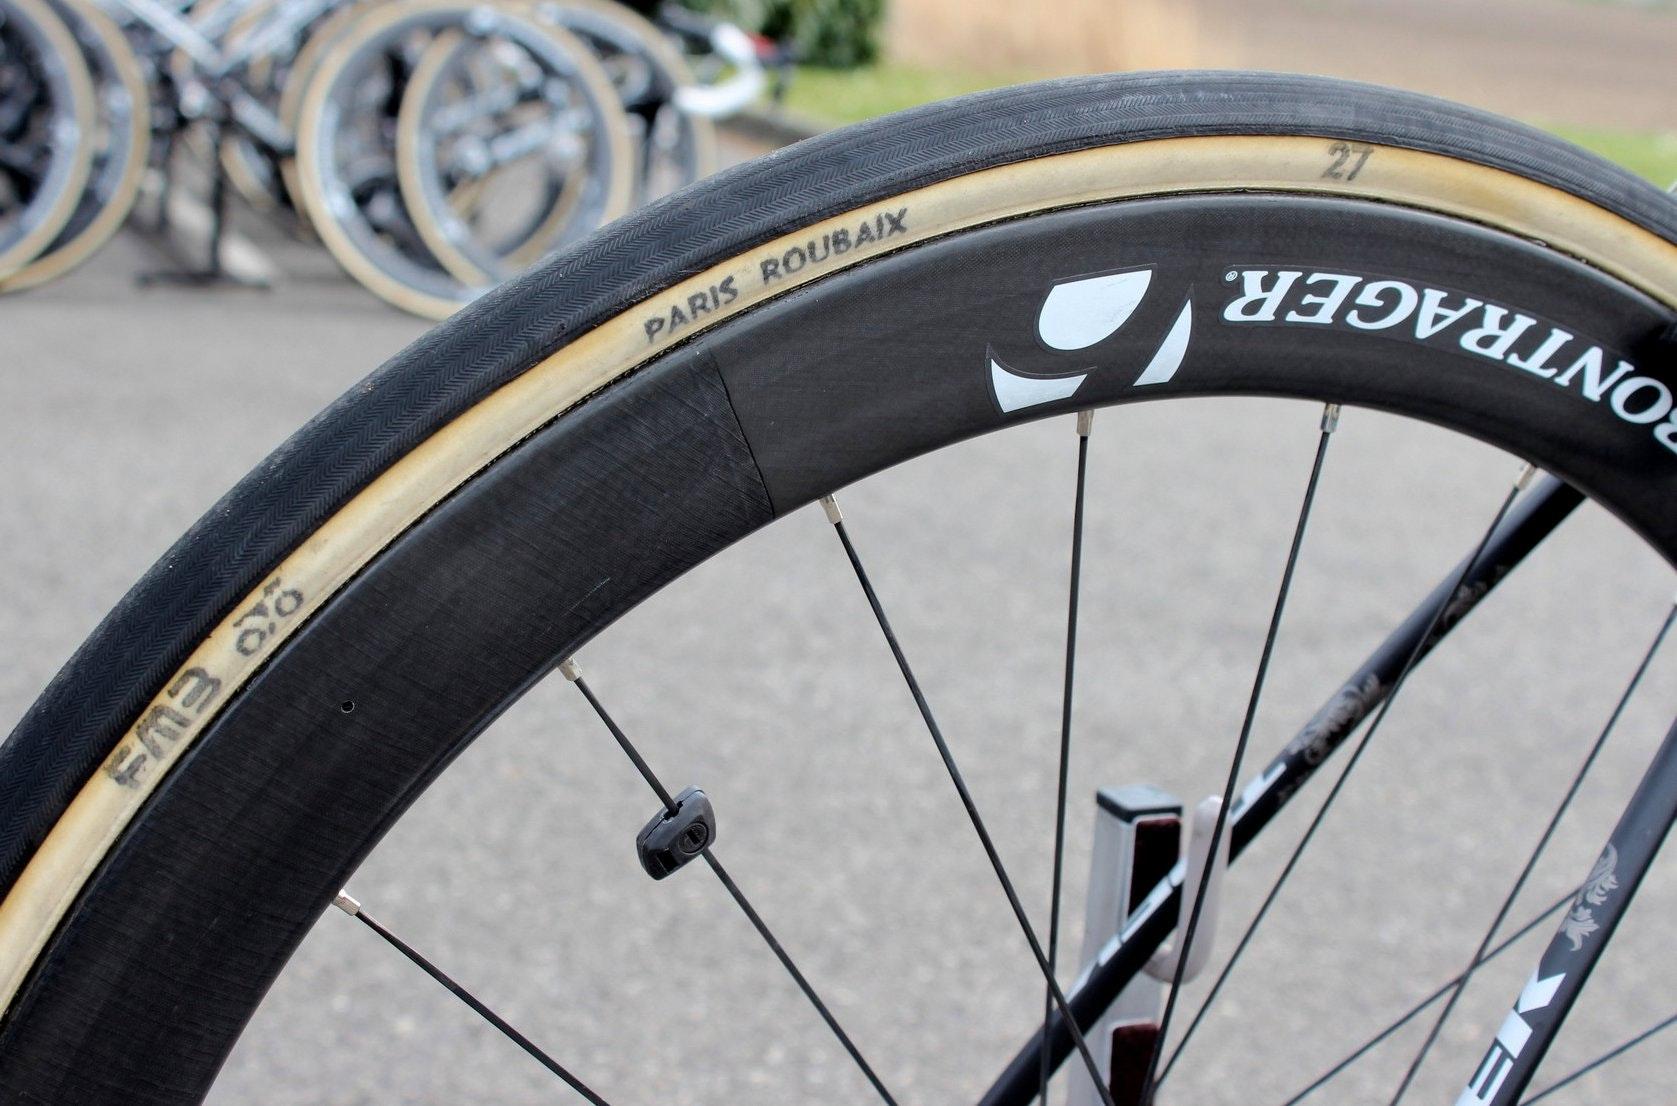 Fabian Cancellara, Trek Domane Classics Edition, pro bike, pic: George Scott/Factory Media